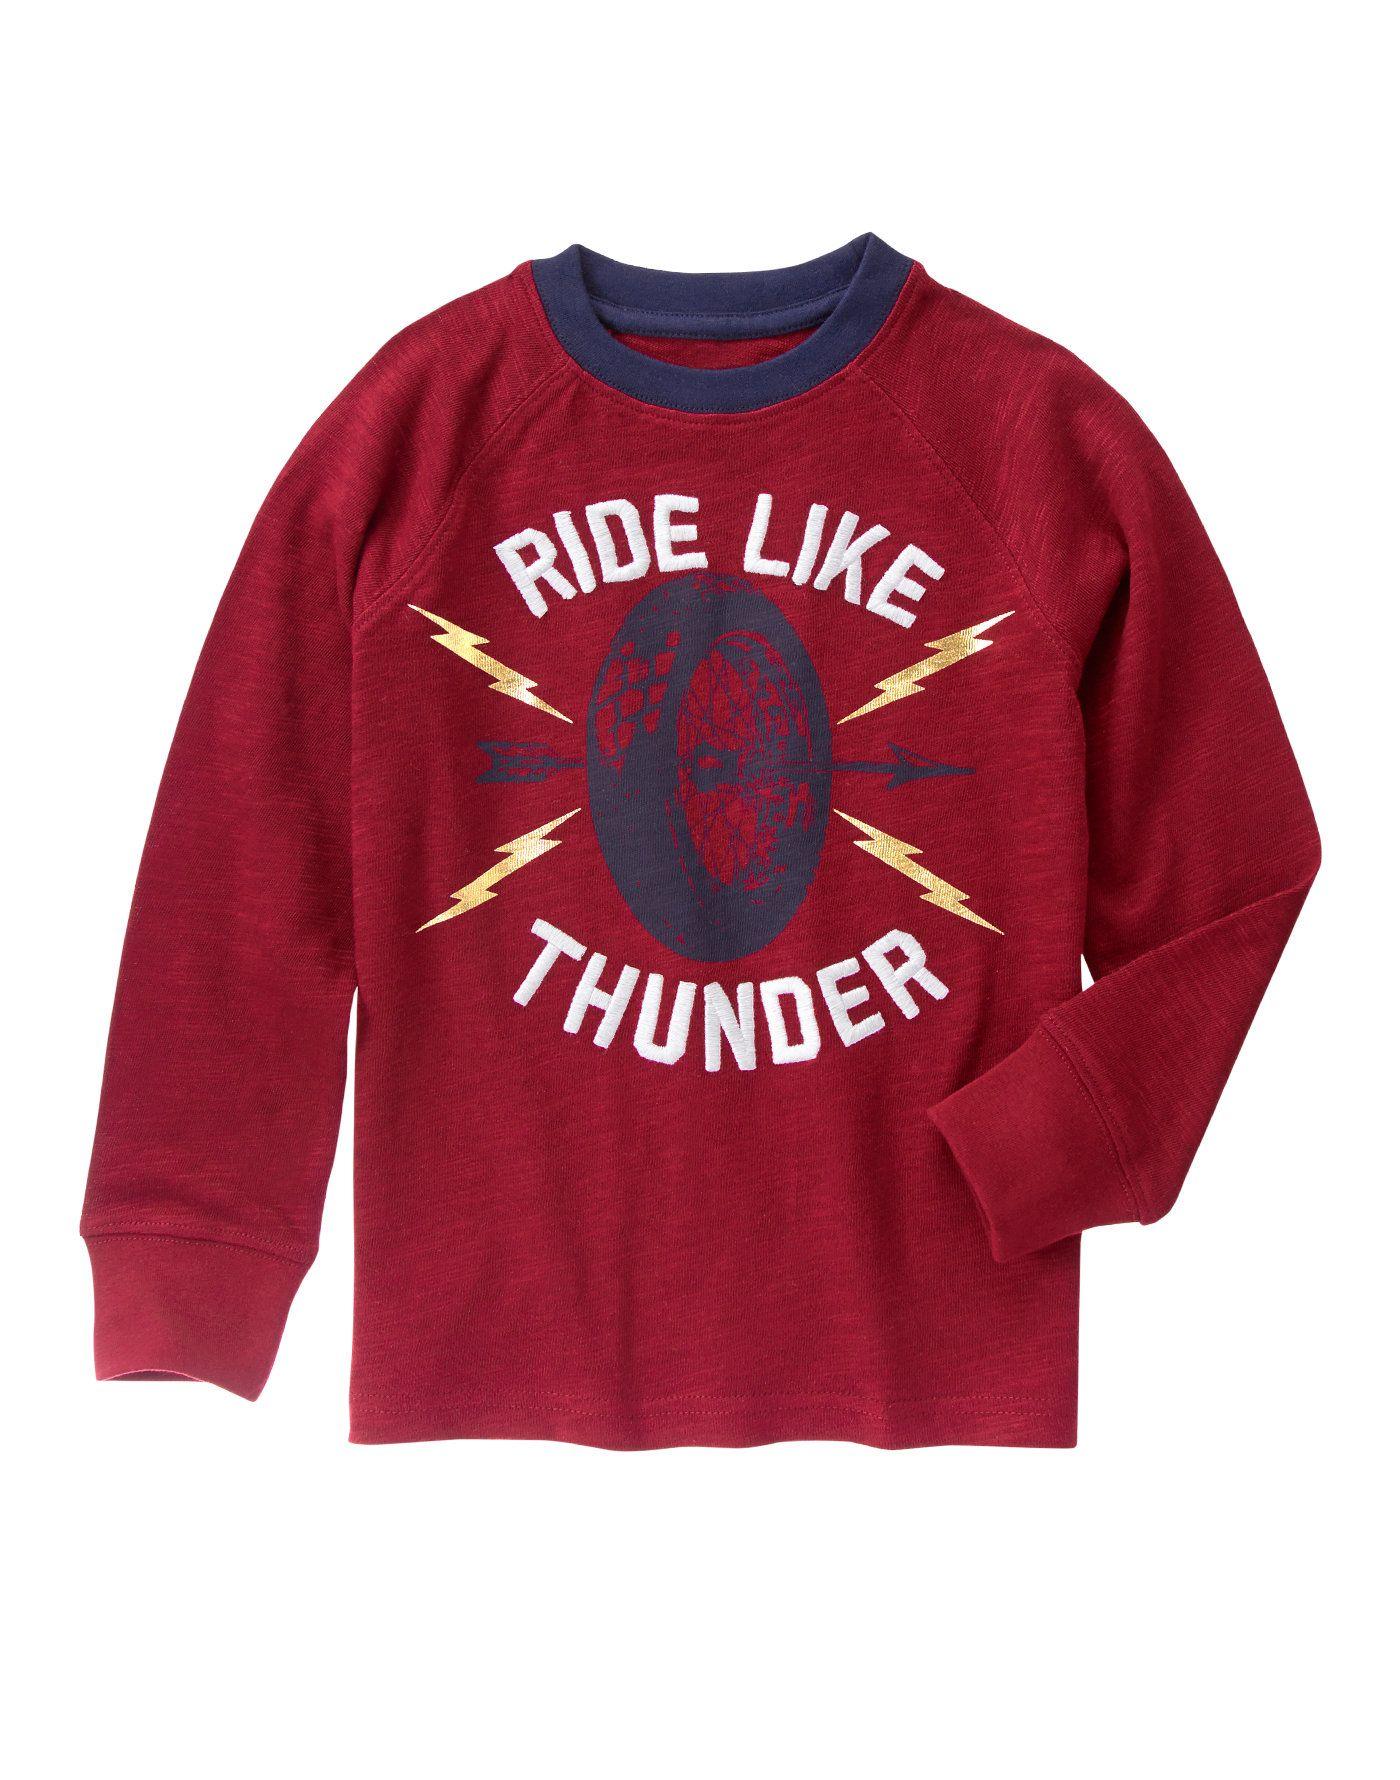 Thunder Top